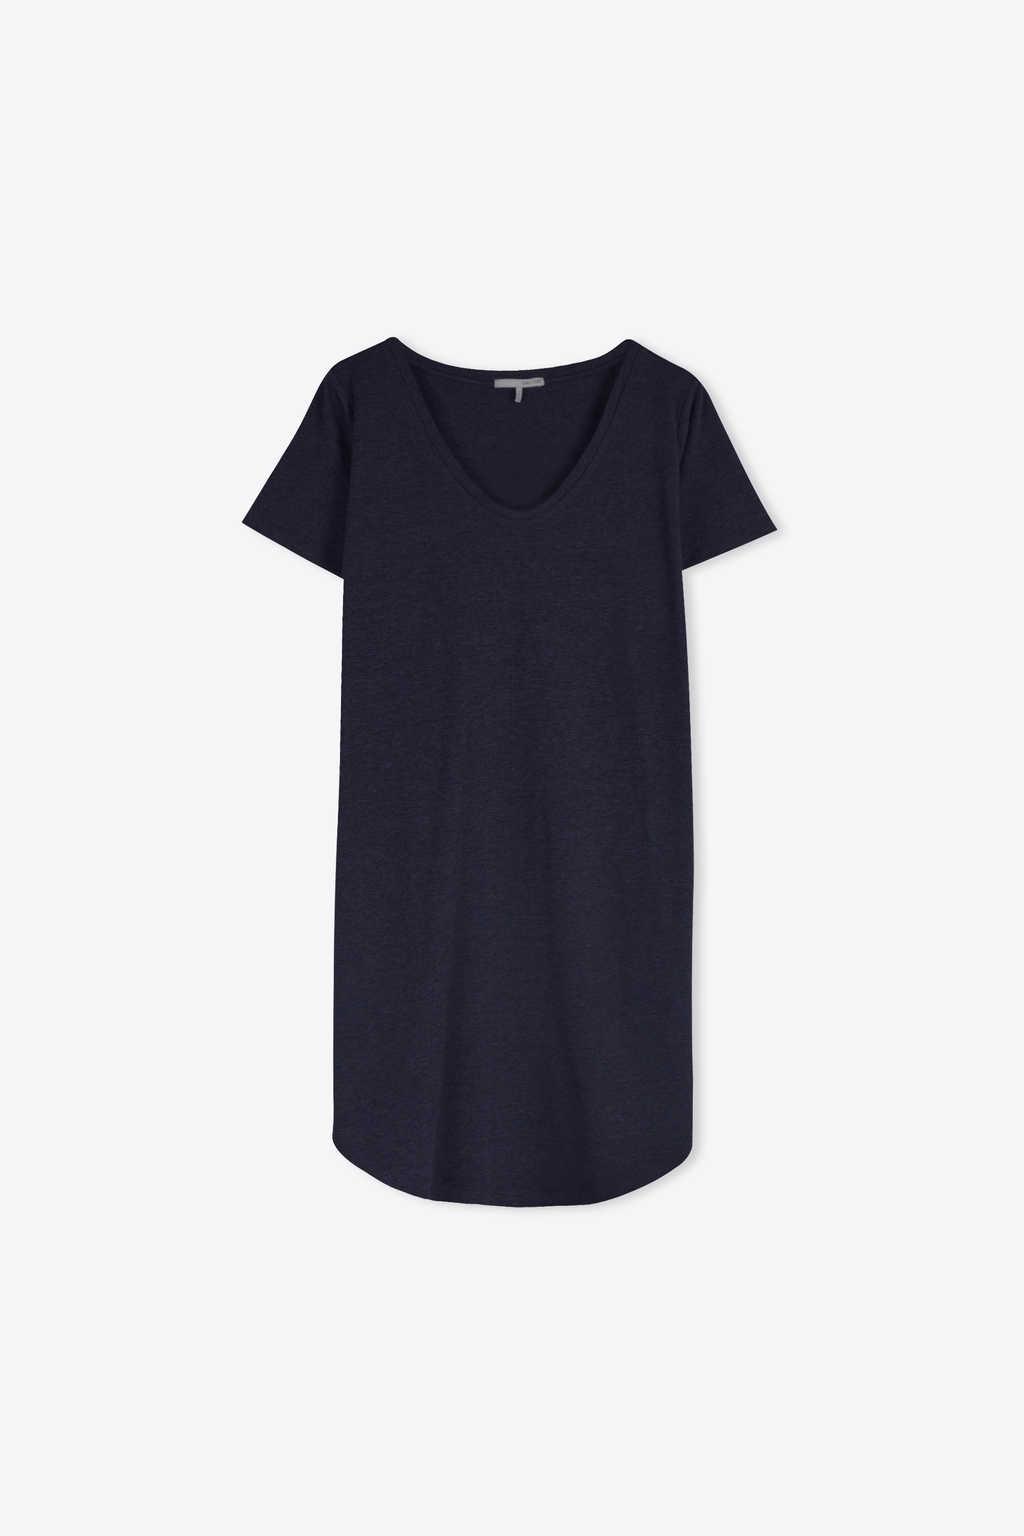 Dress 1202 Navy 9